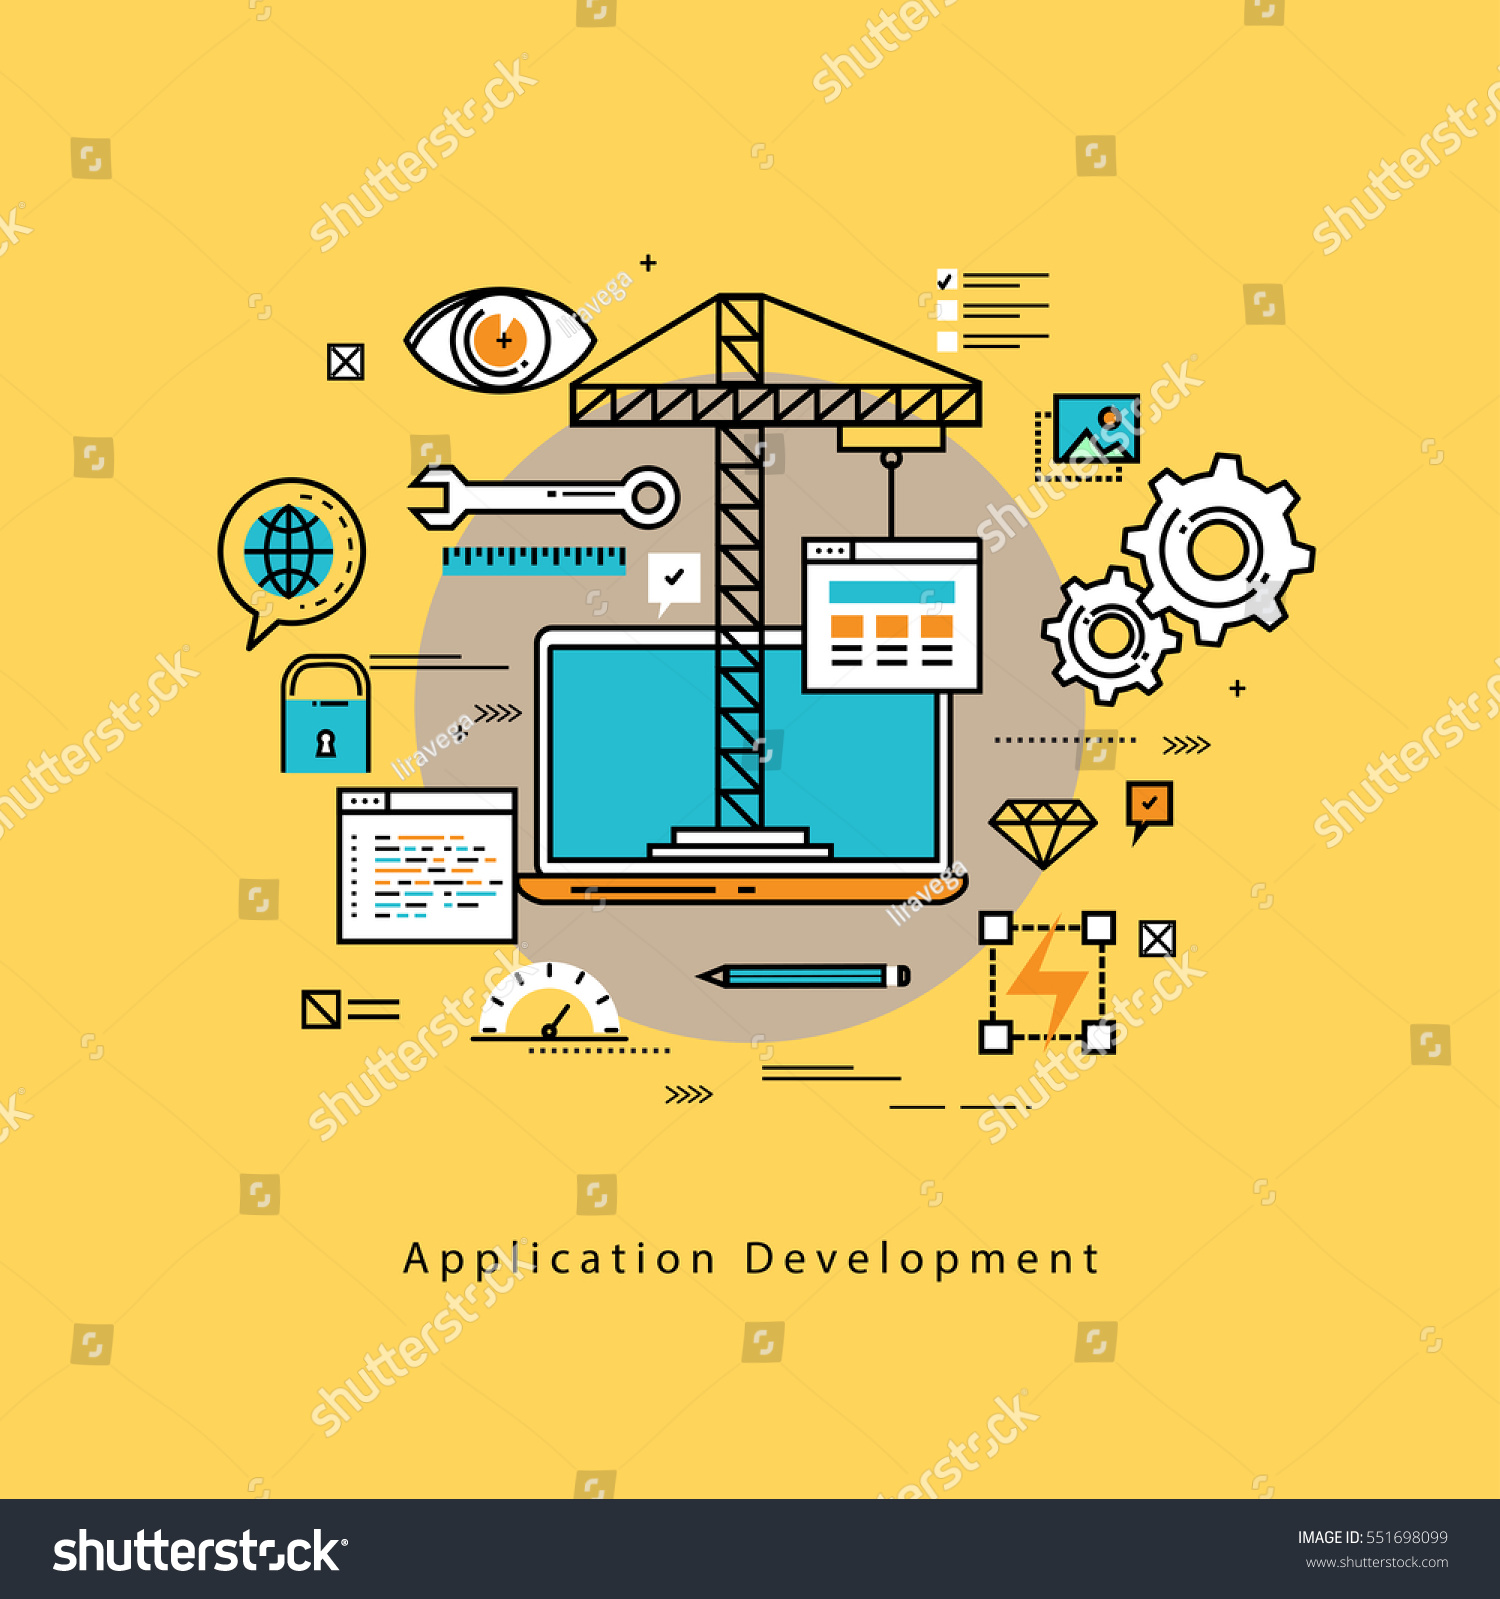 Application Development Flat Line Business Vector Stock